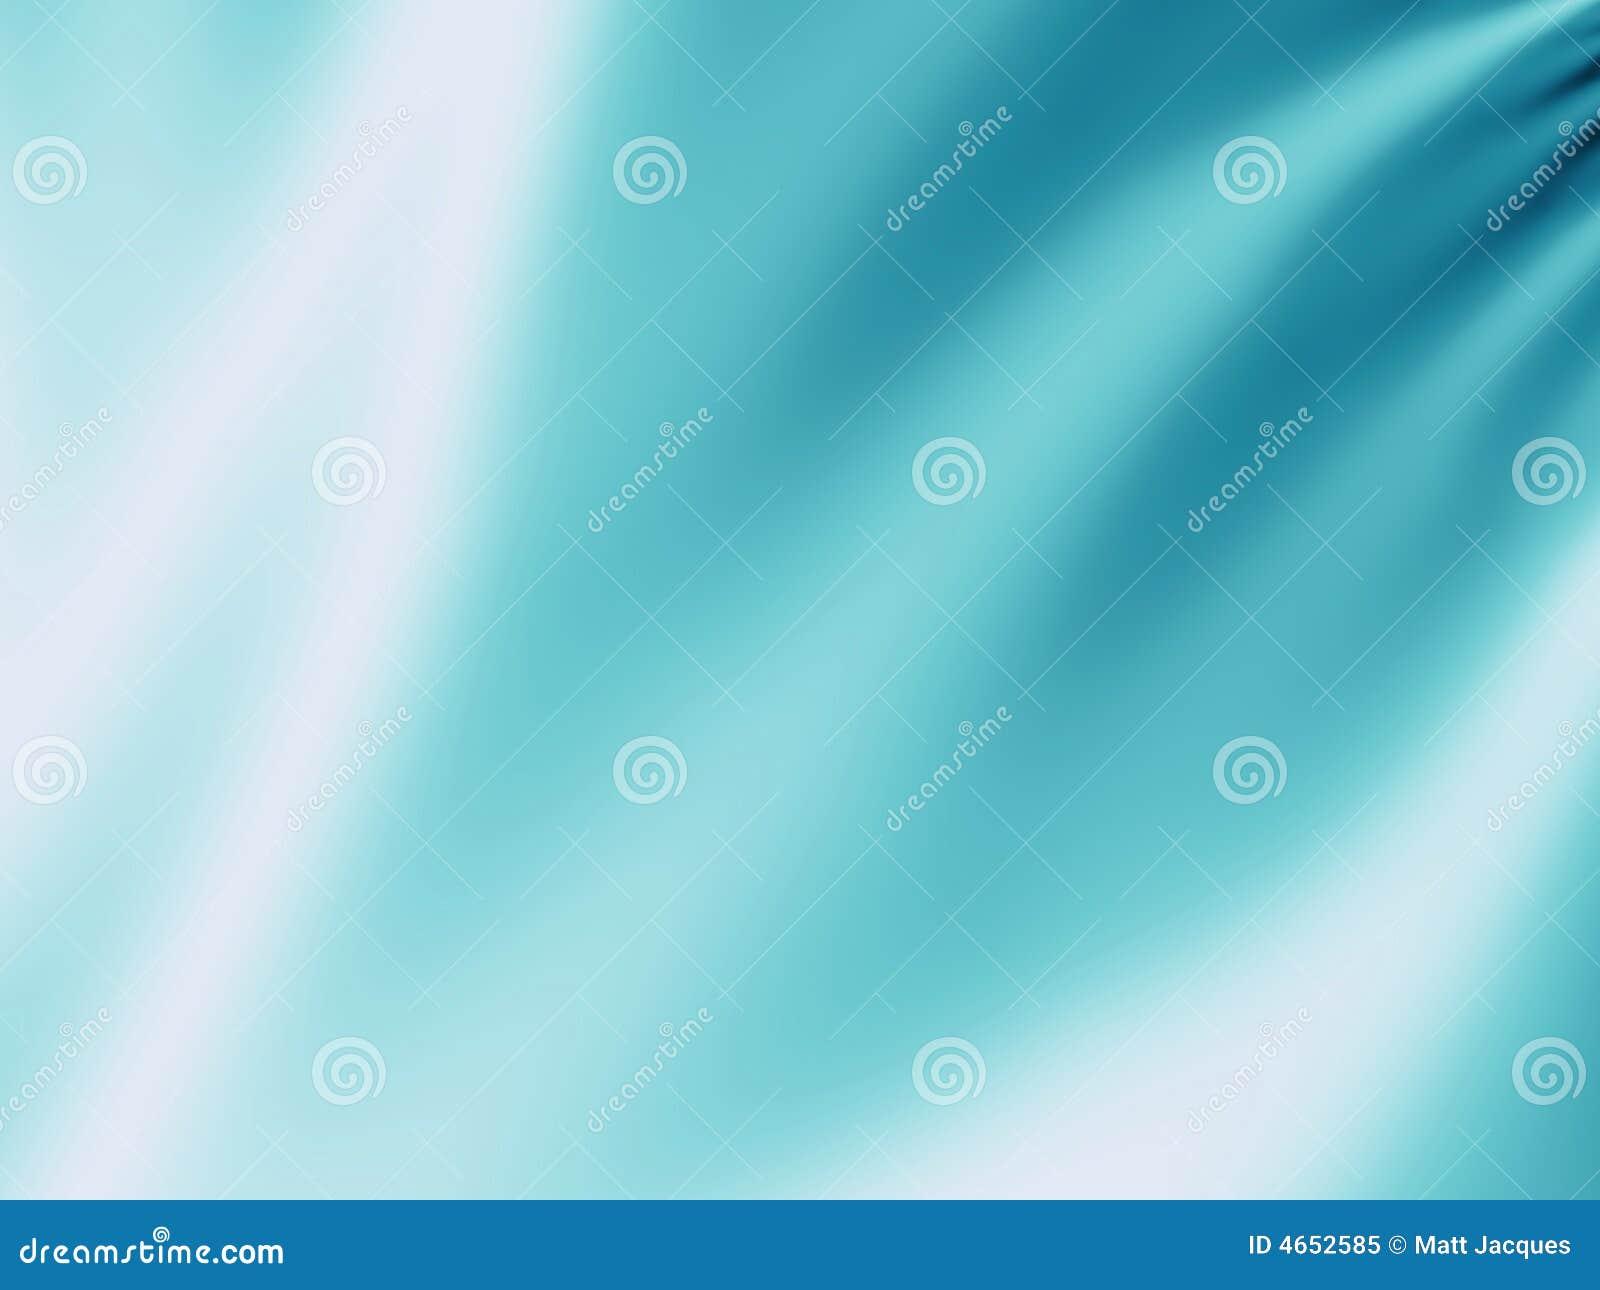 Teal Blue Velvet Fabric Royalty Free Stock Photo